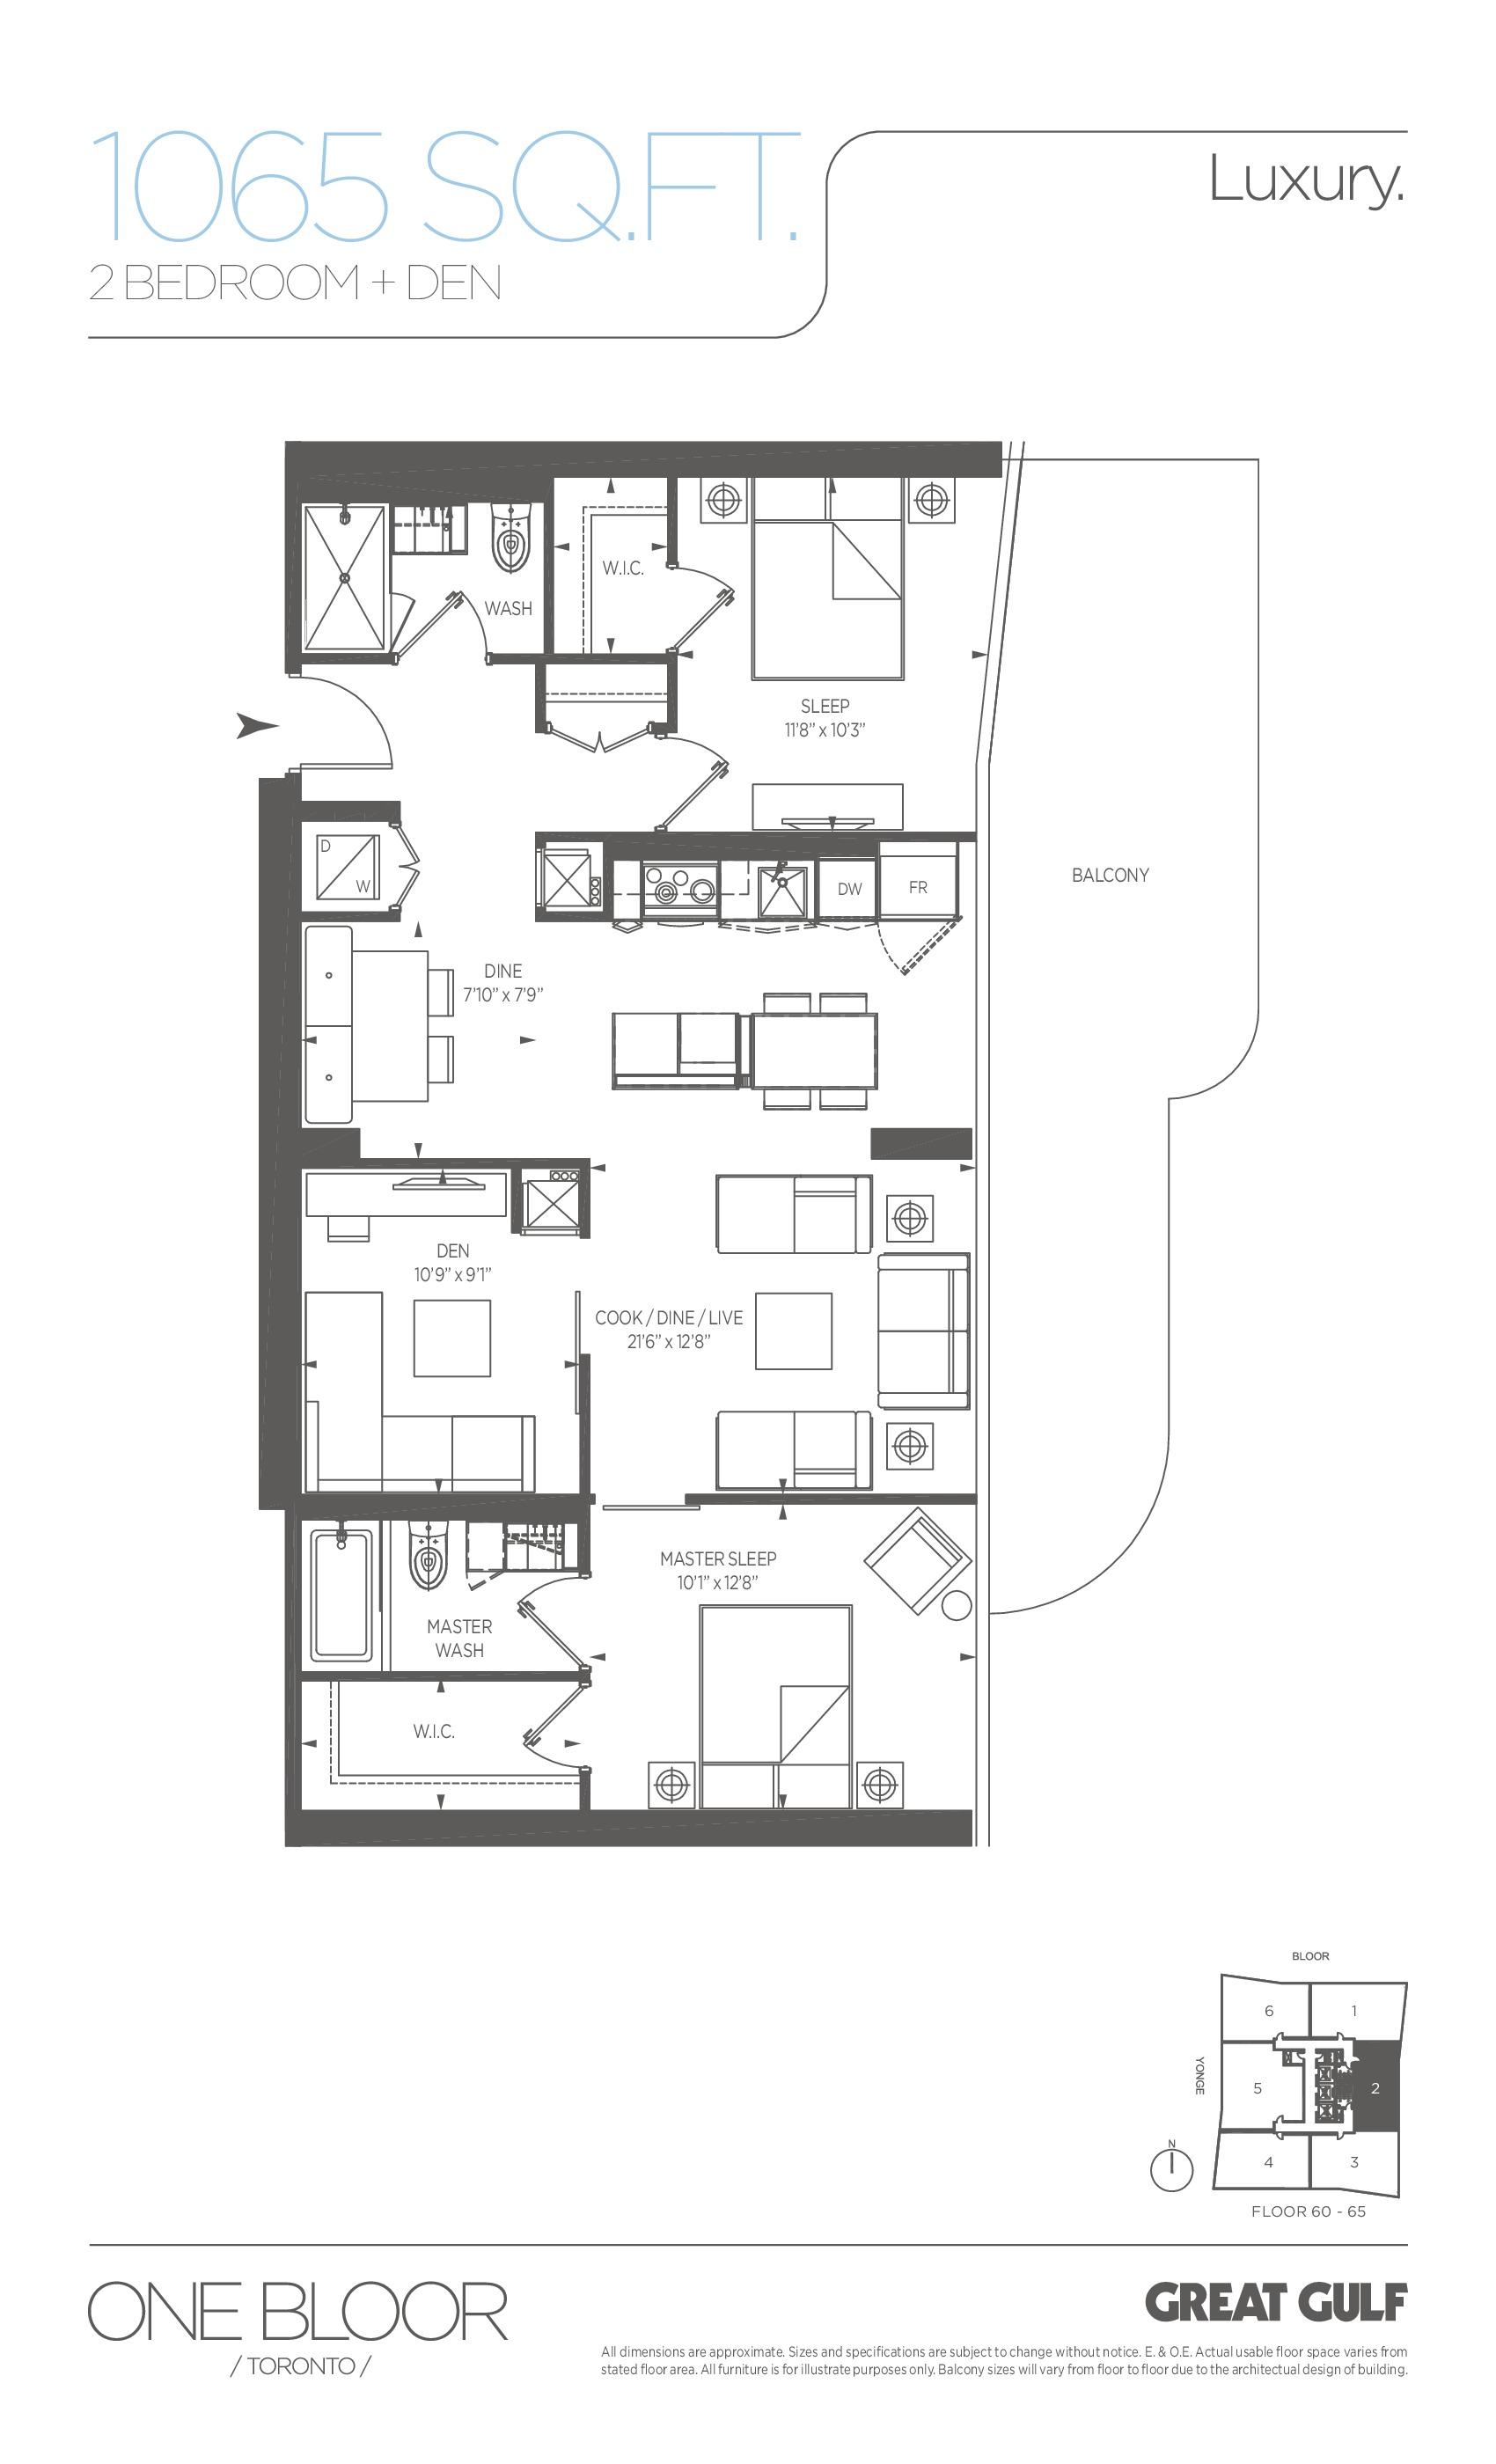 Luxury Floor Plan at One Bloor Condos - 1065 sq.ft